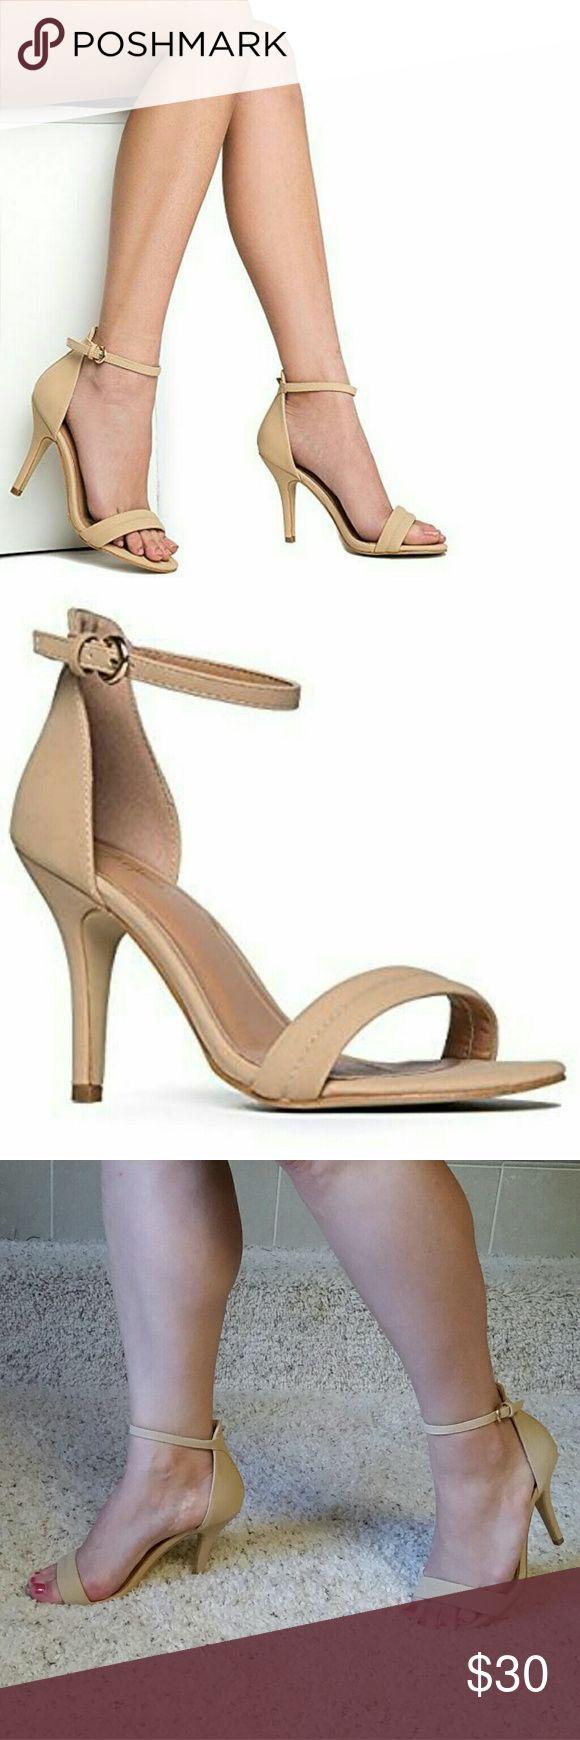 J. Adams Grammy nude strappy high heels Gorgeous new j. Adams nude slim strappy heels. Perfect elegant dress heels. Size 8 Forever 21 Shoes Heels